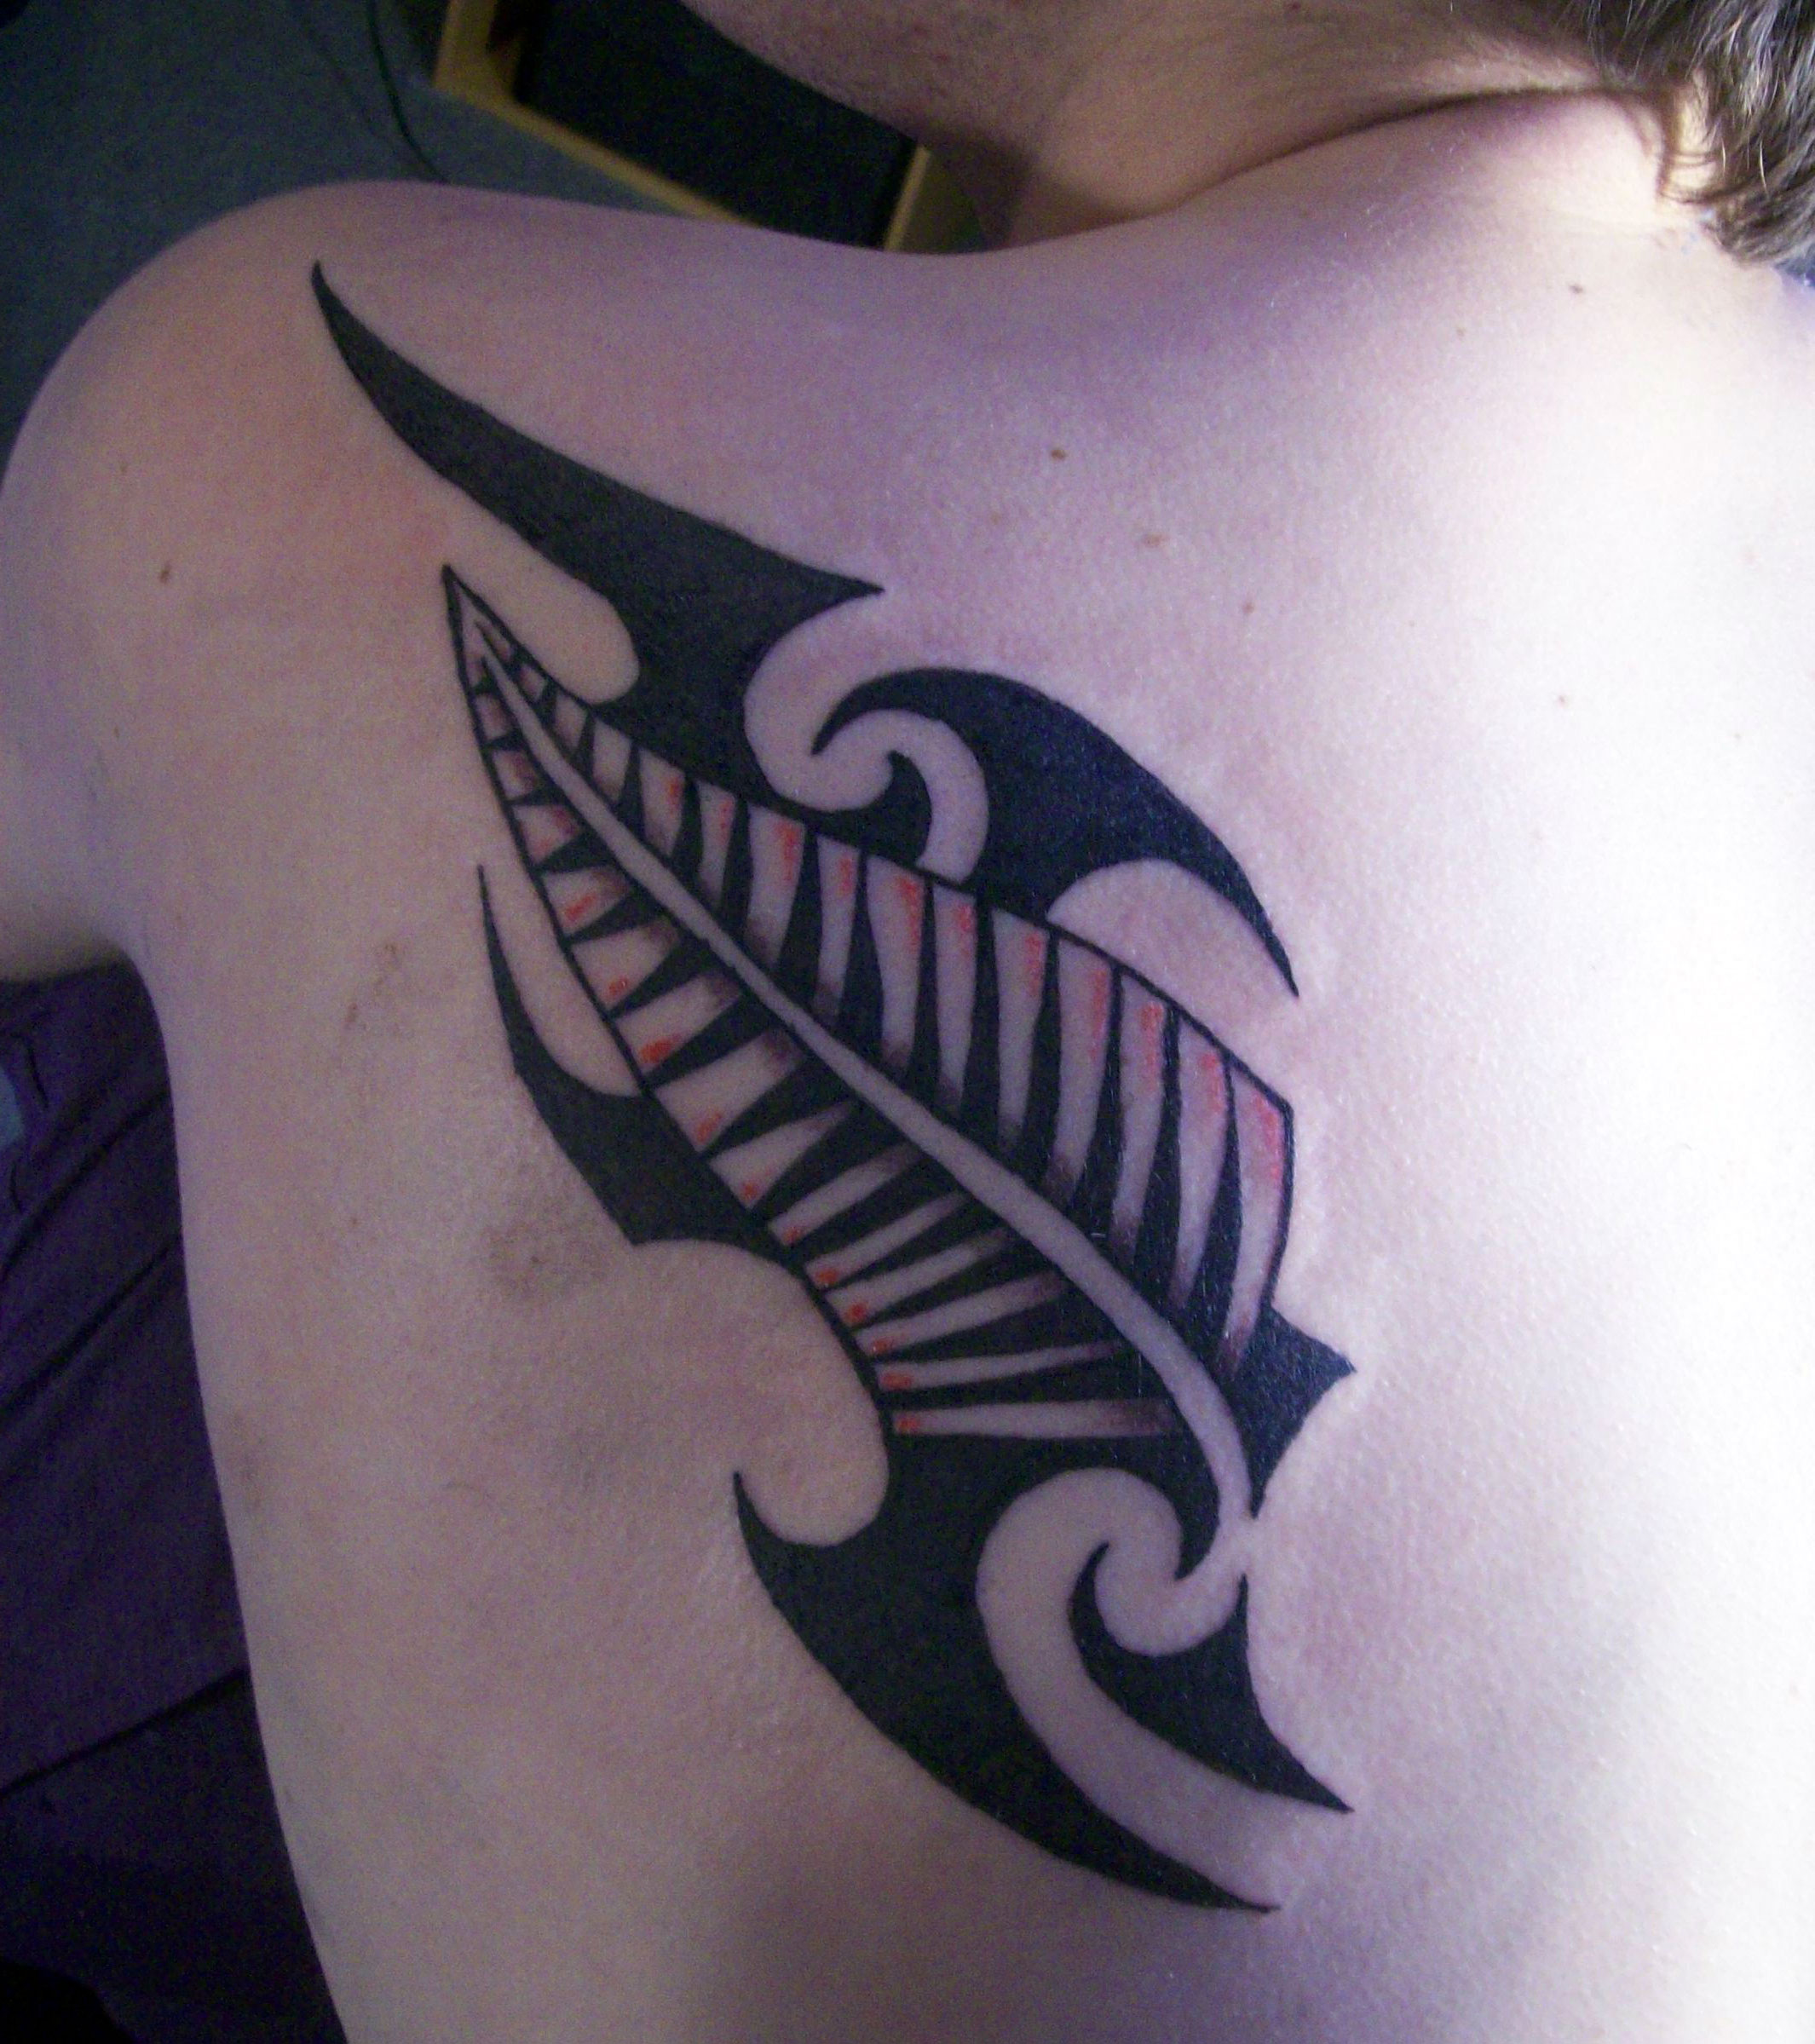 celtic design arm tattoos tattoo shops in south river nj new zealand tribal tattoo designs. Black Bedroom Furniture Sets. Home Design Ideas